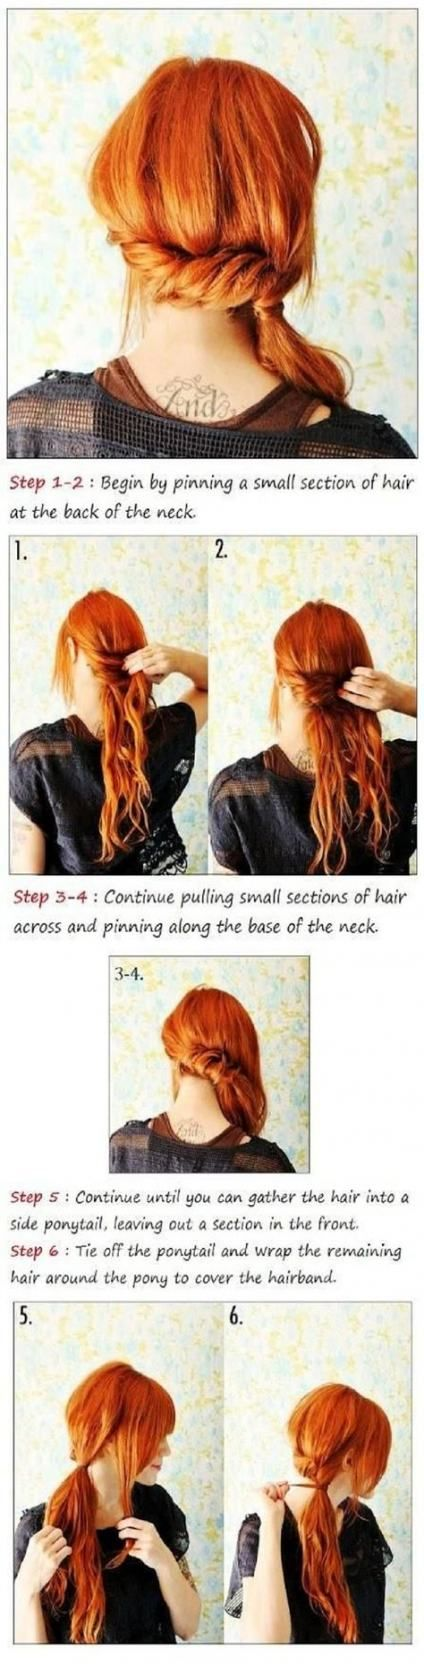 Super Hair Styles Long Fringe Shoulder Length 18+ Ideas